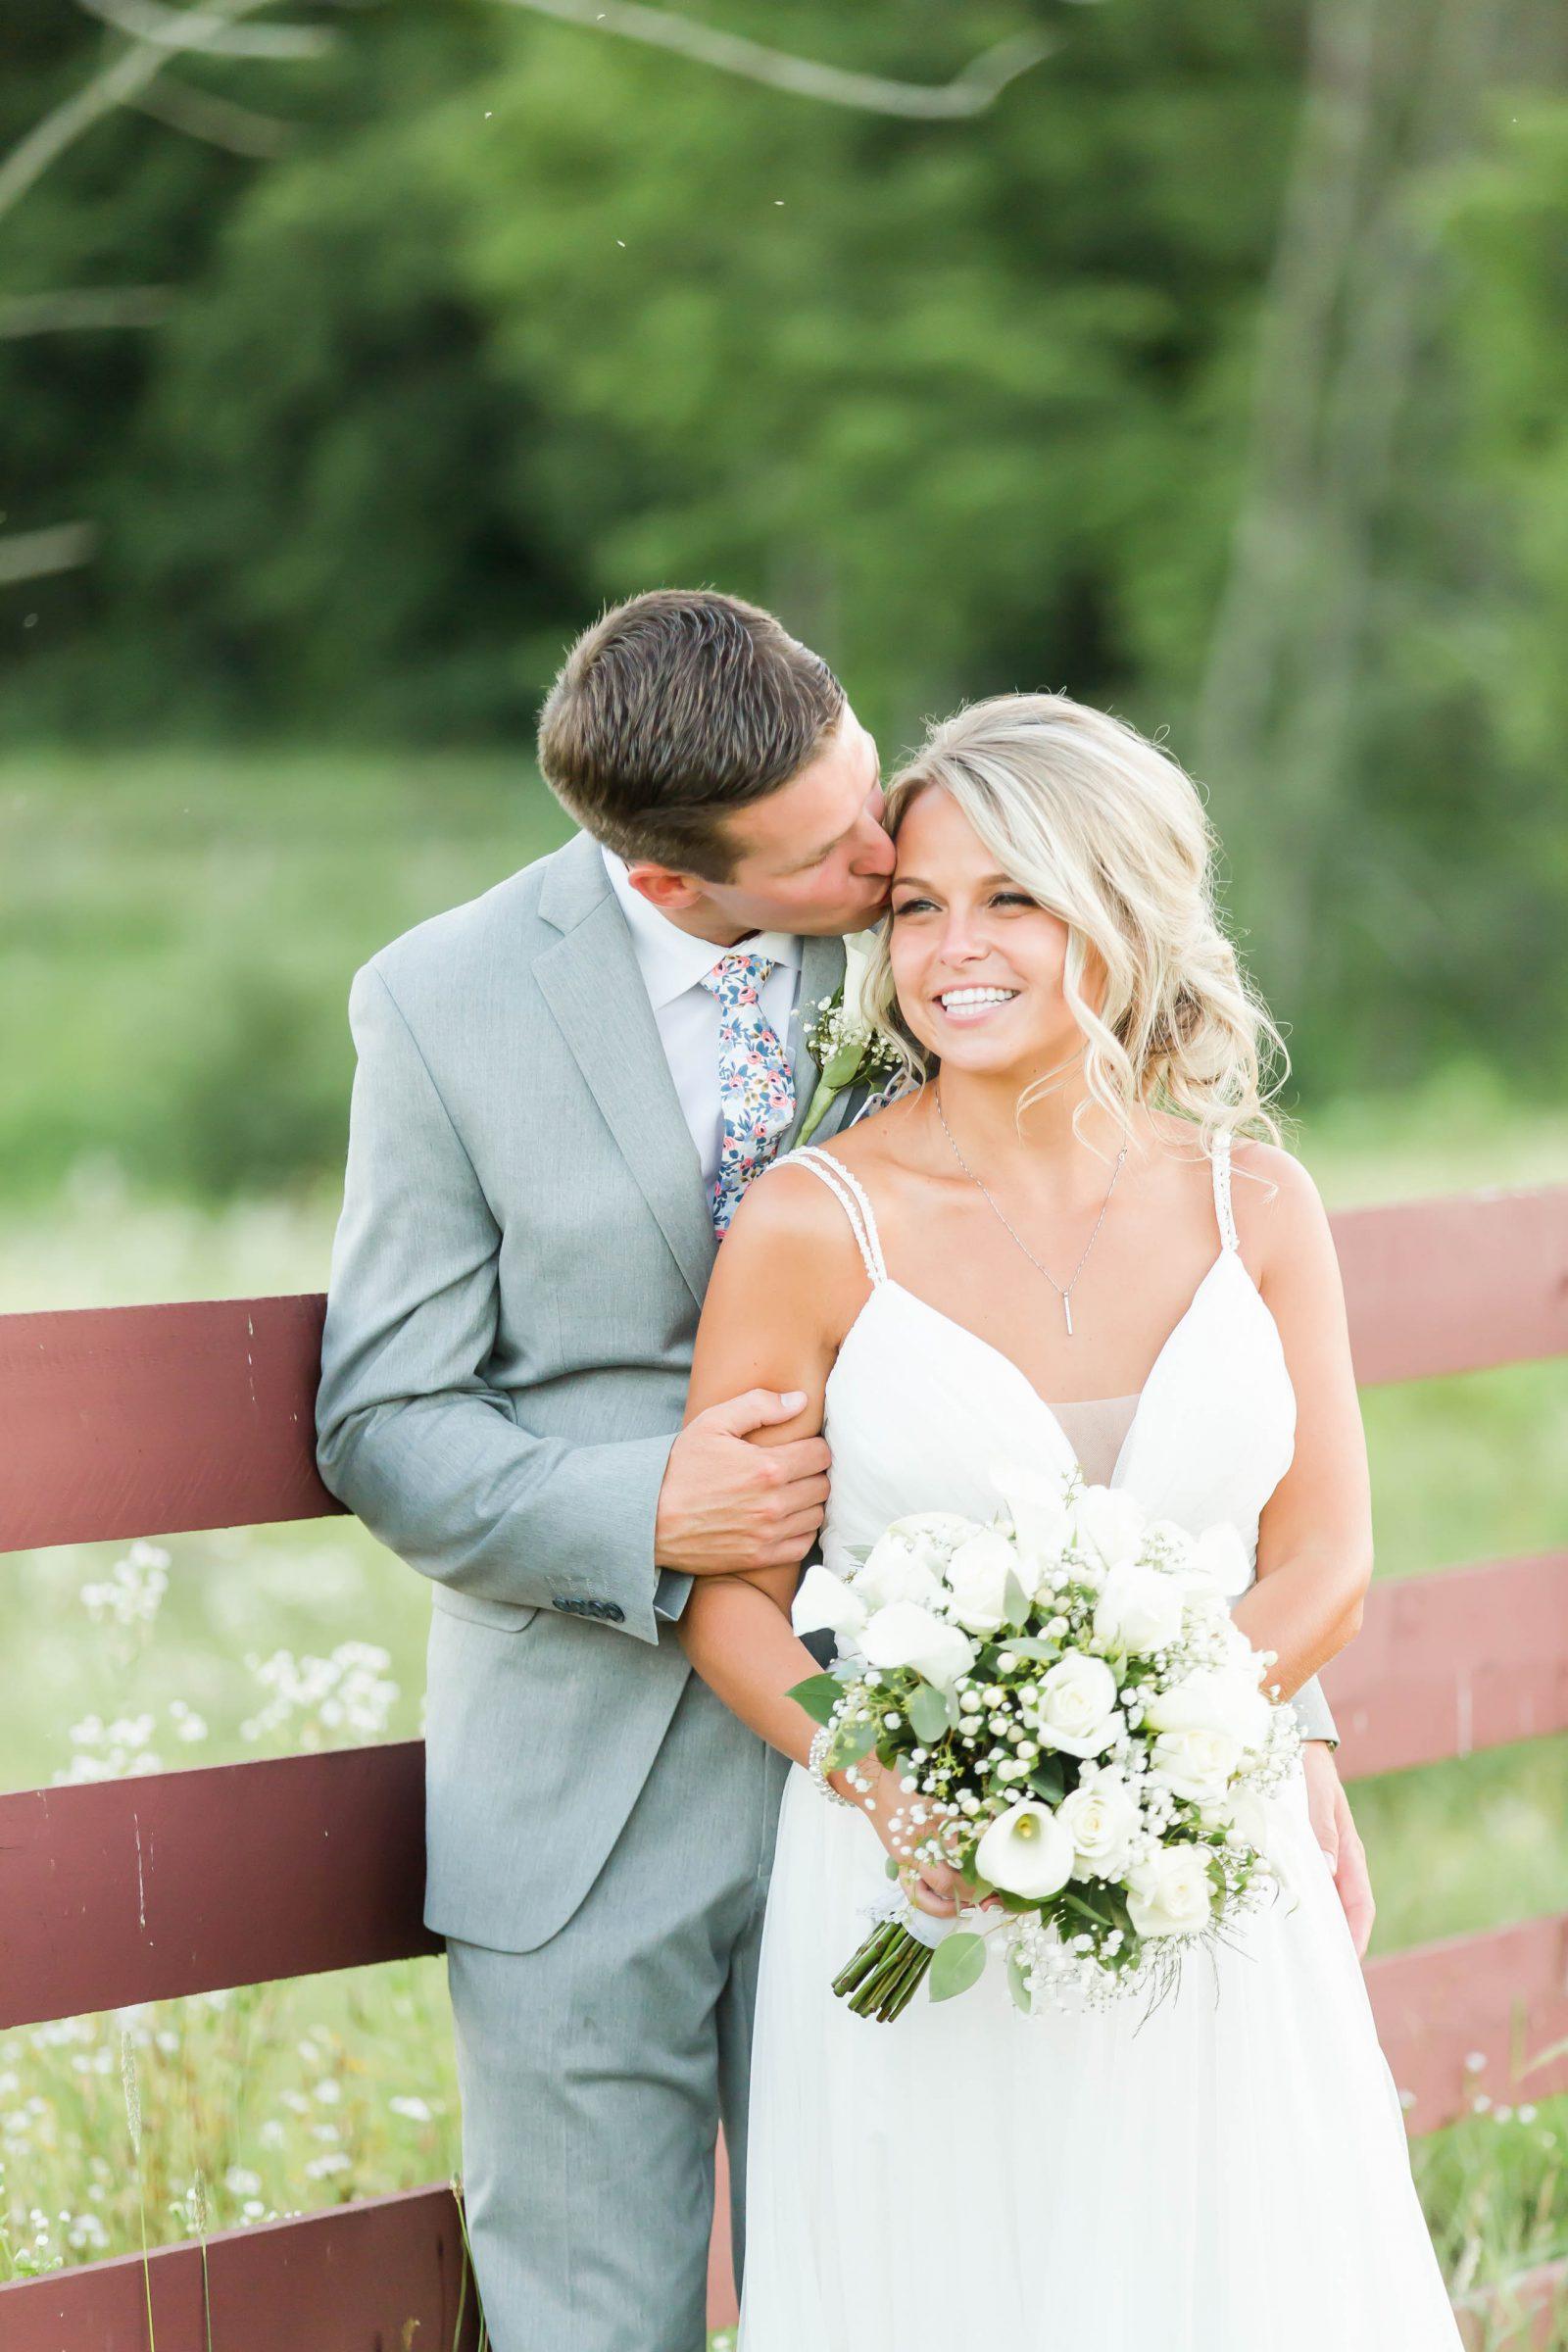 peacock-ridge-summer-wedding-photographer-akron-ohio-loren-jackson-photography-119